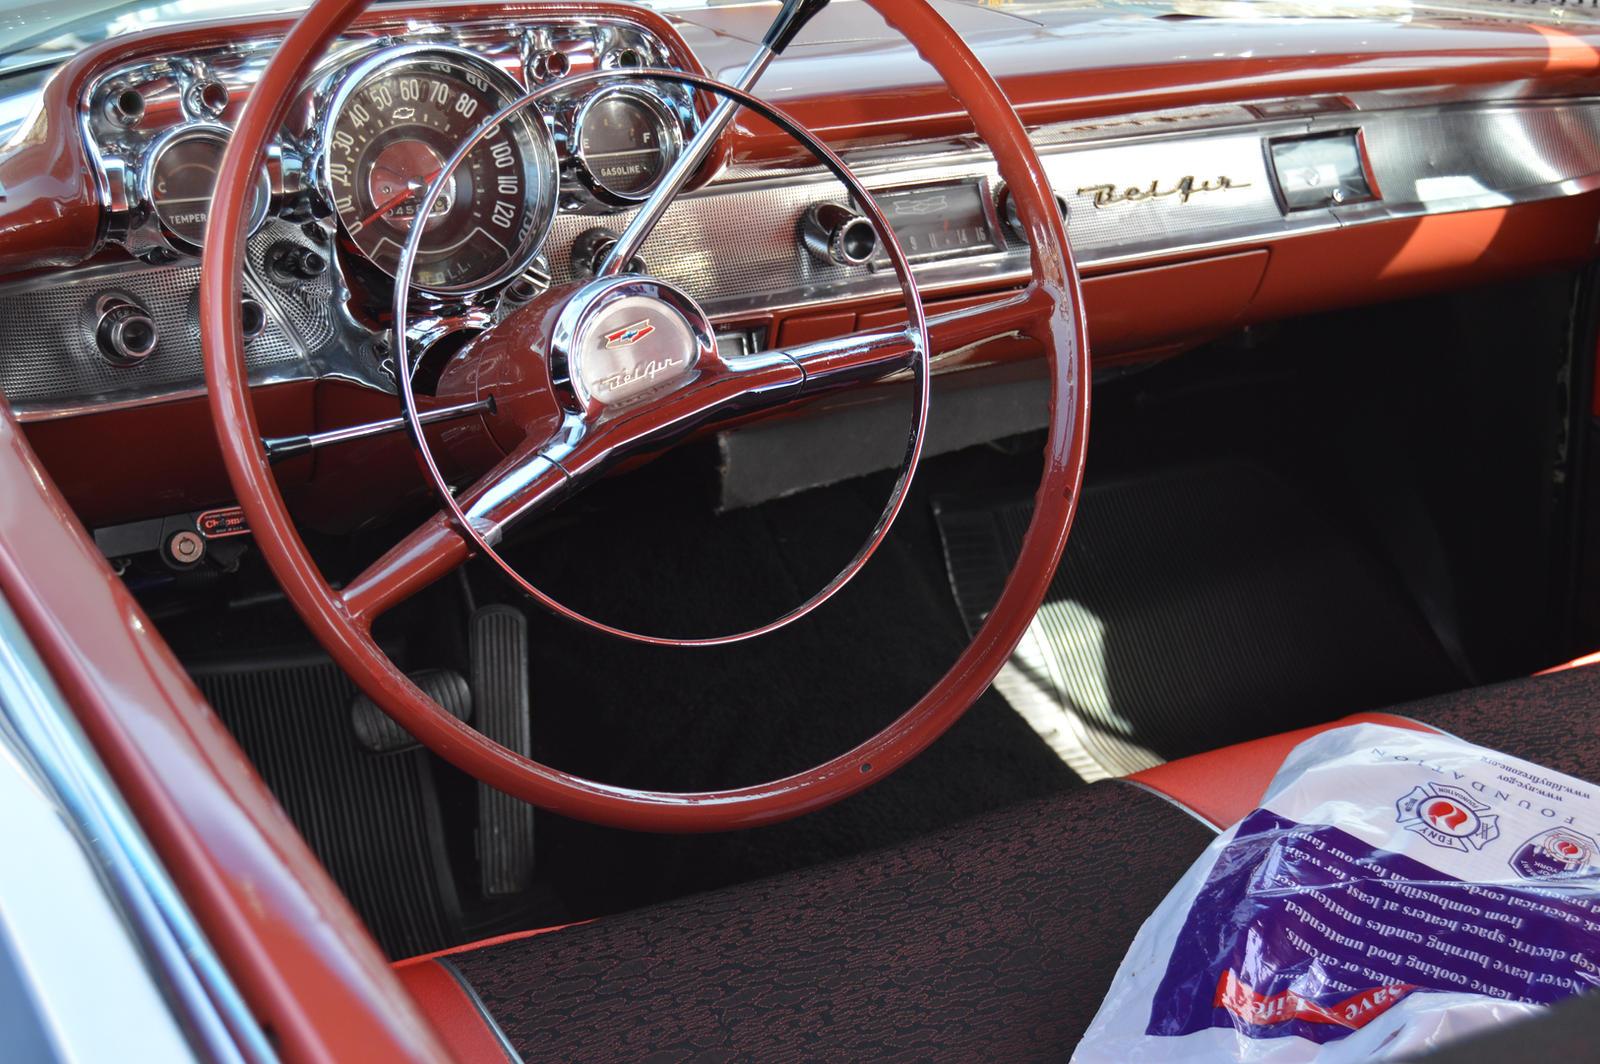 1957 Chevrolet Bel Air Interior Ii By Brooklyn47 On Deviantart